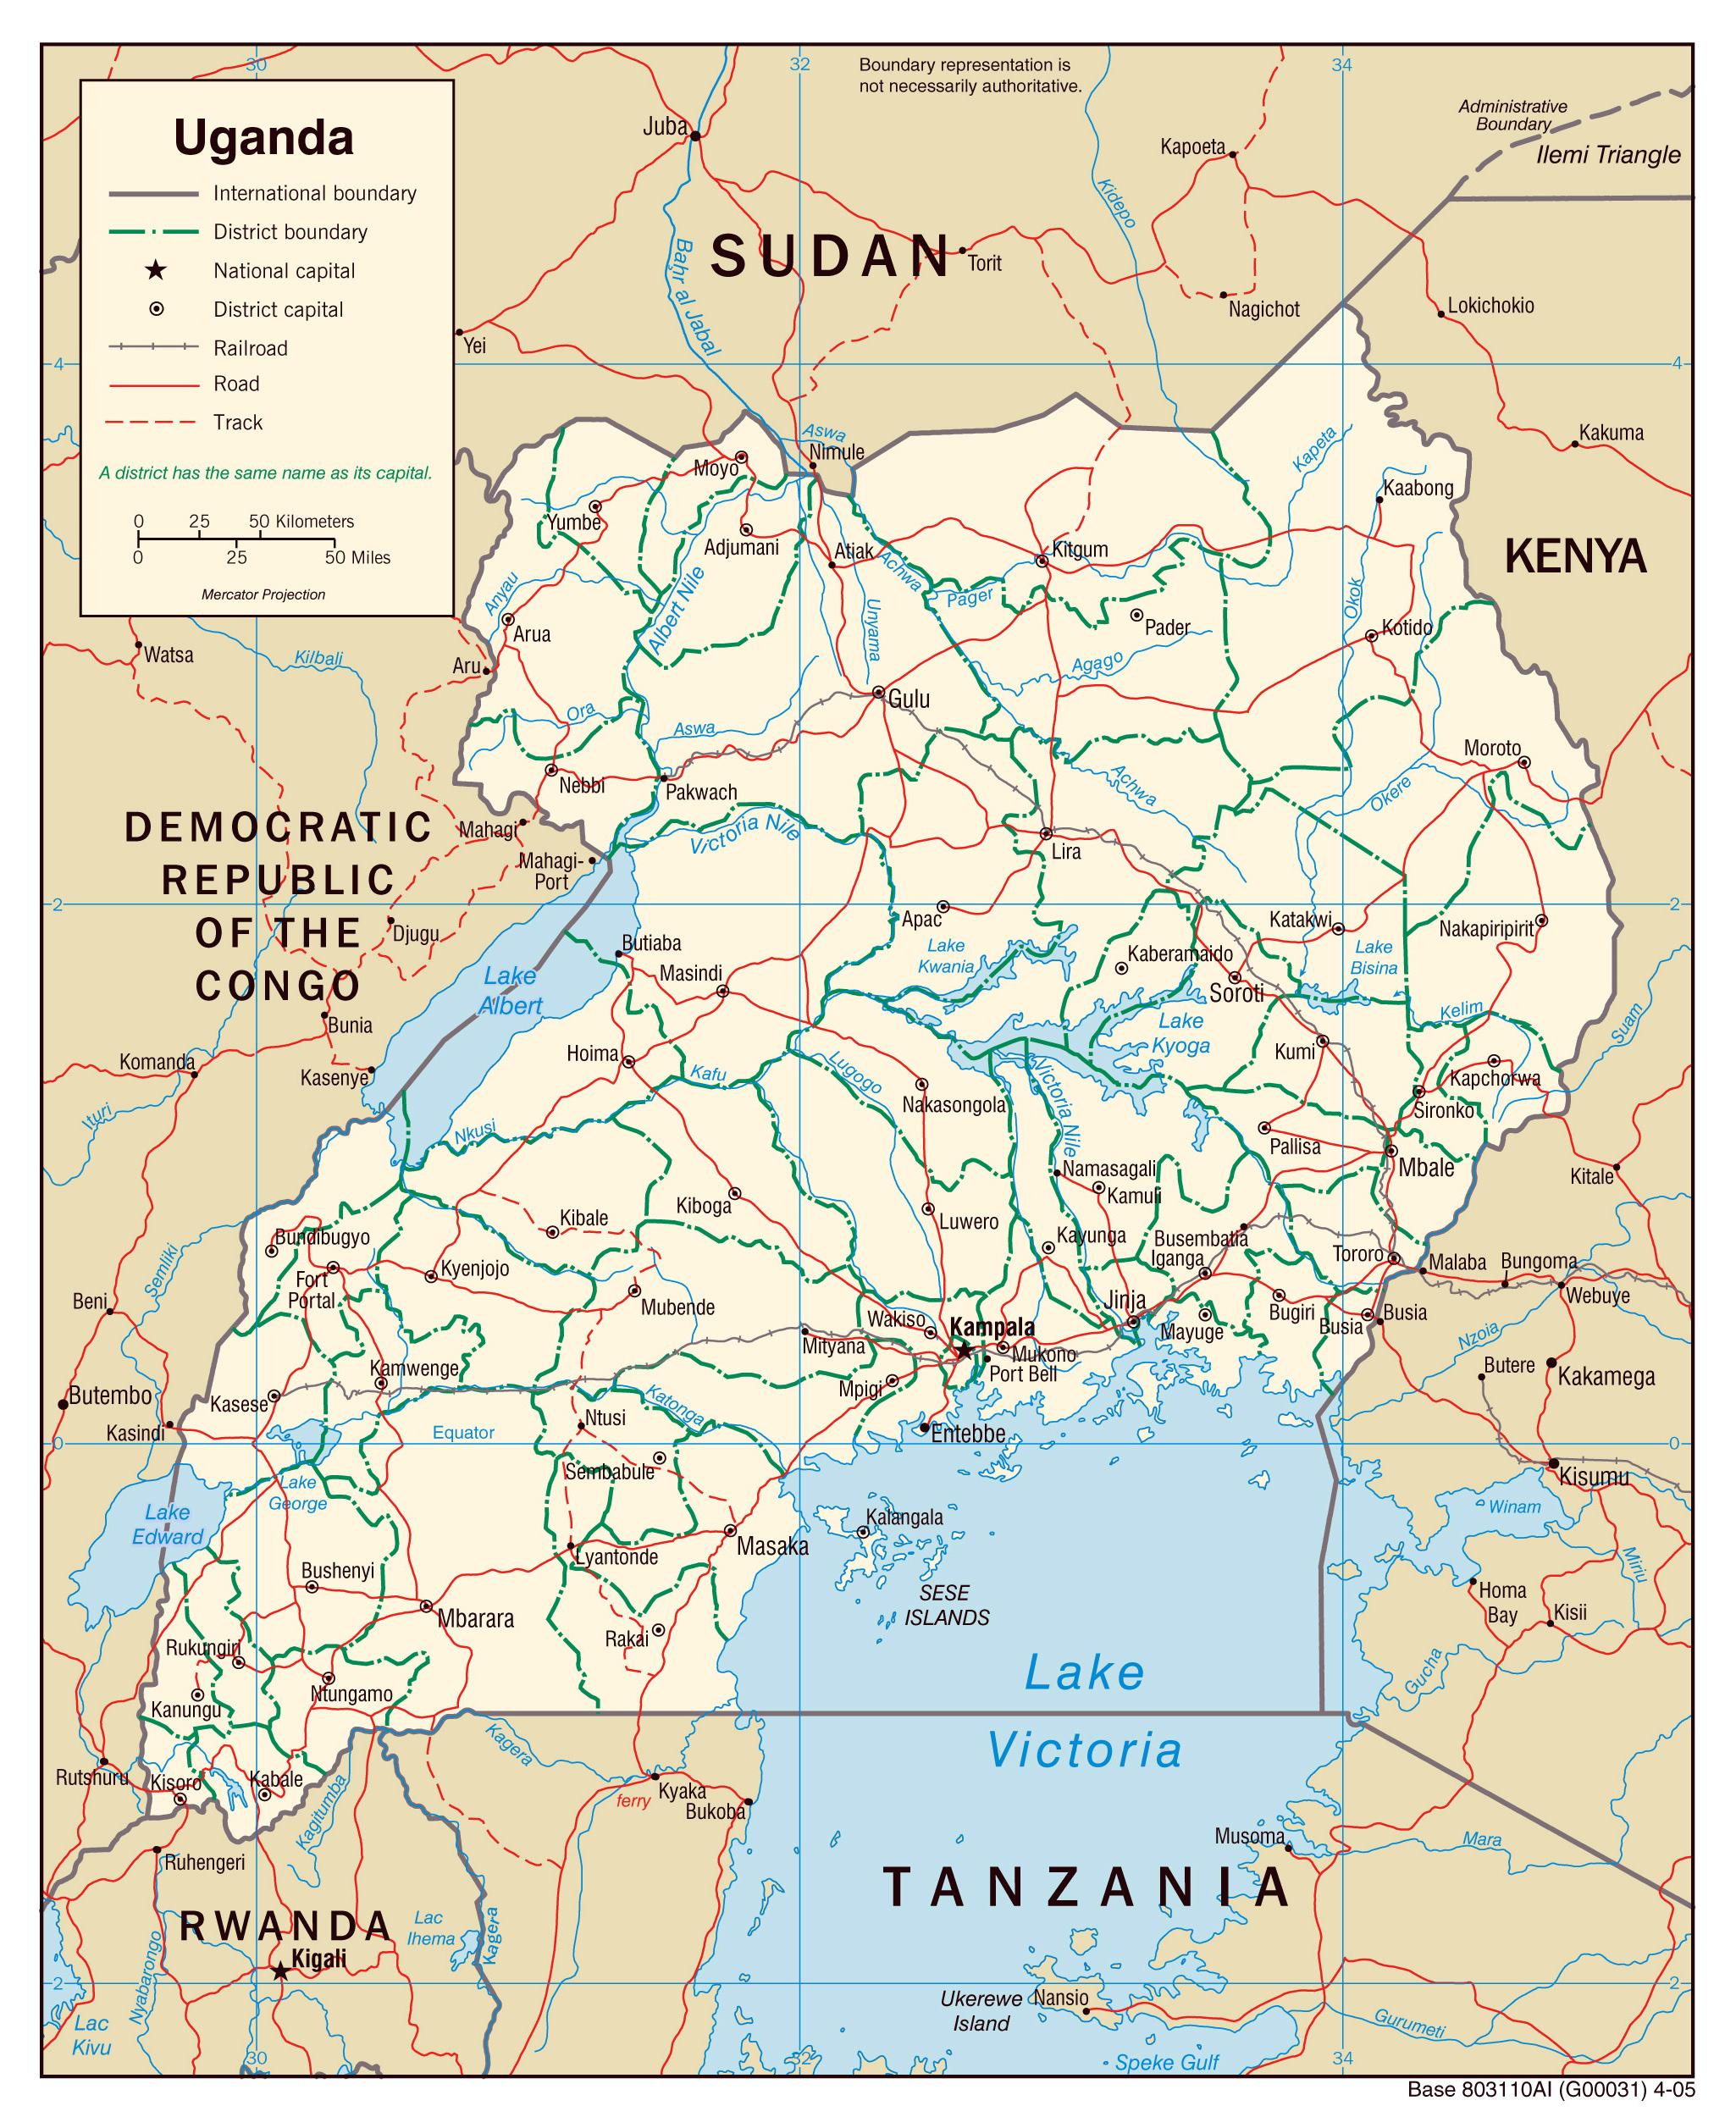 Detailed political map of Uganda Uganda detailed political map